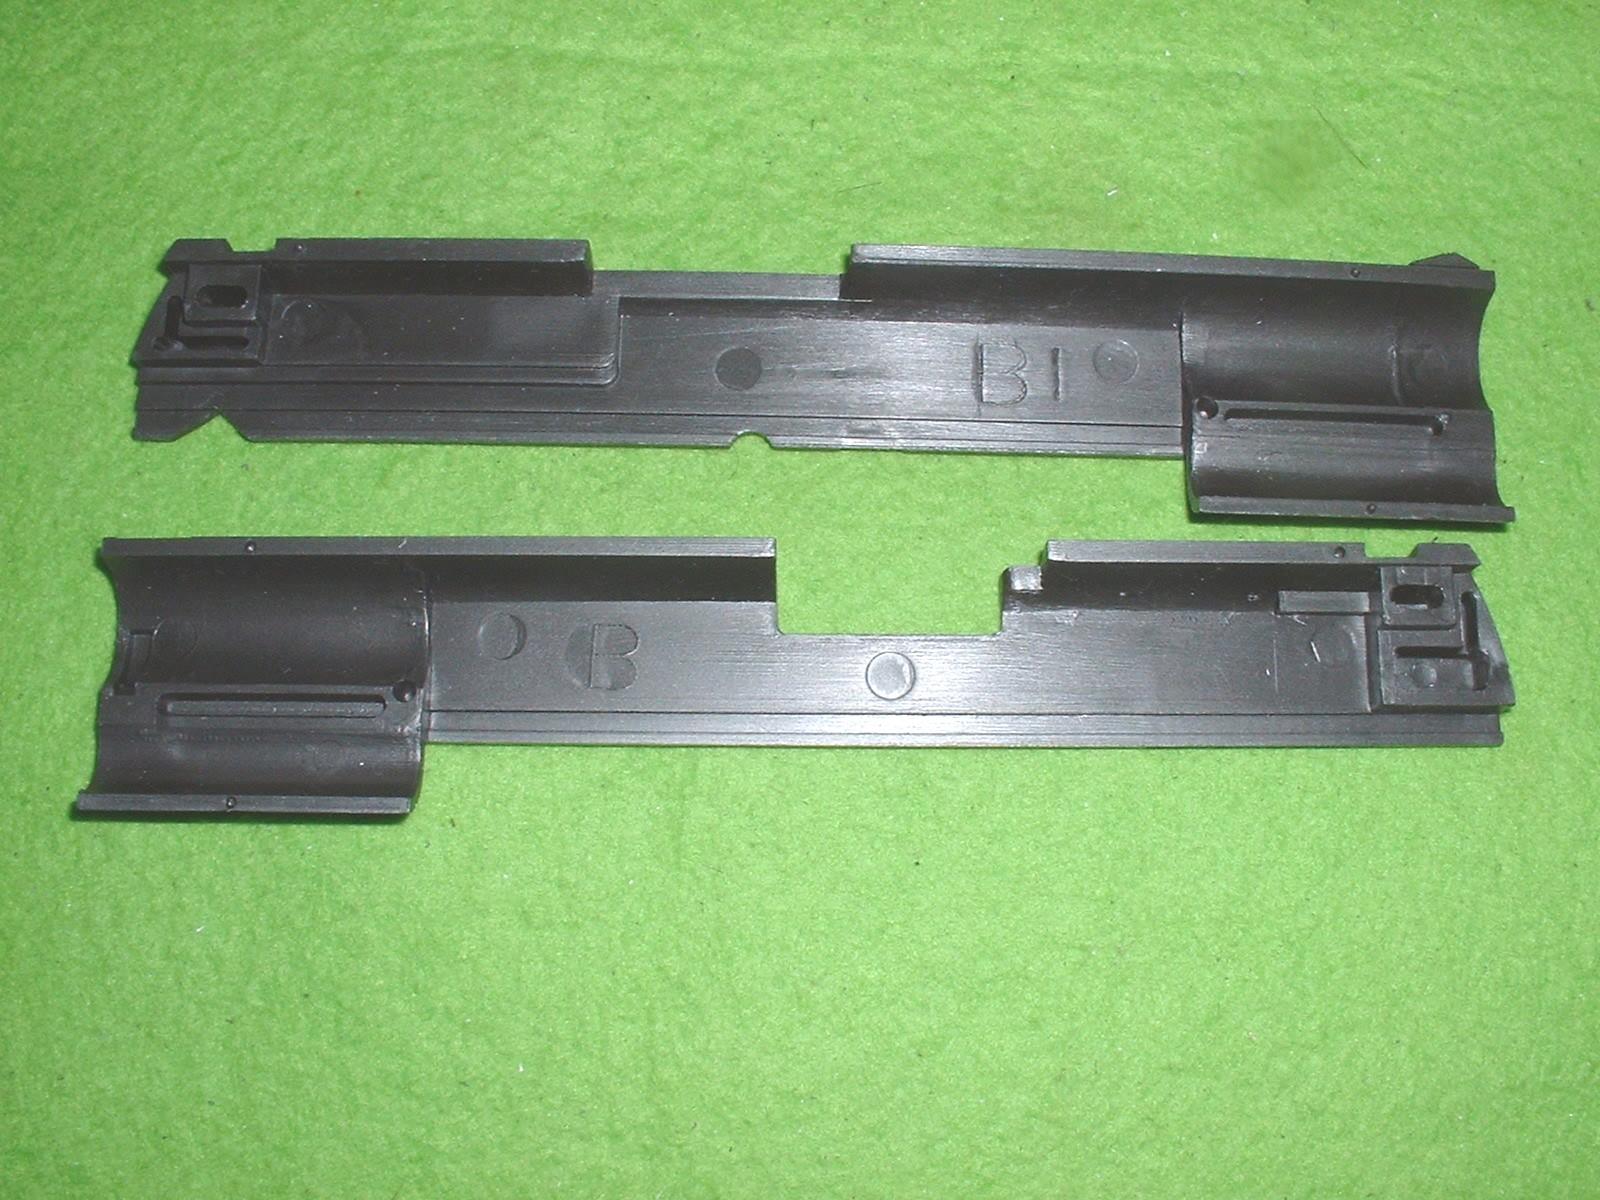 LS コマンダー スライド左側内側 B1の刻印あり Doburoku-TAO.JPG